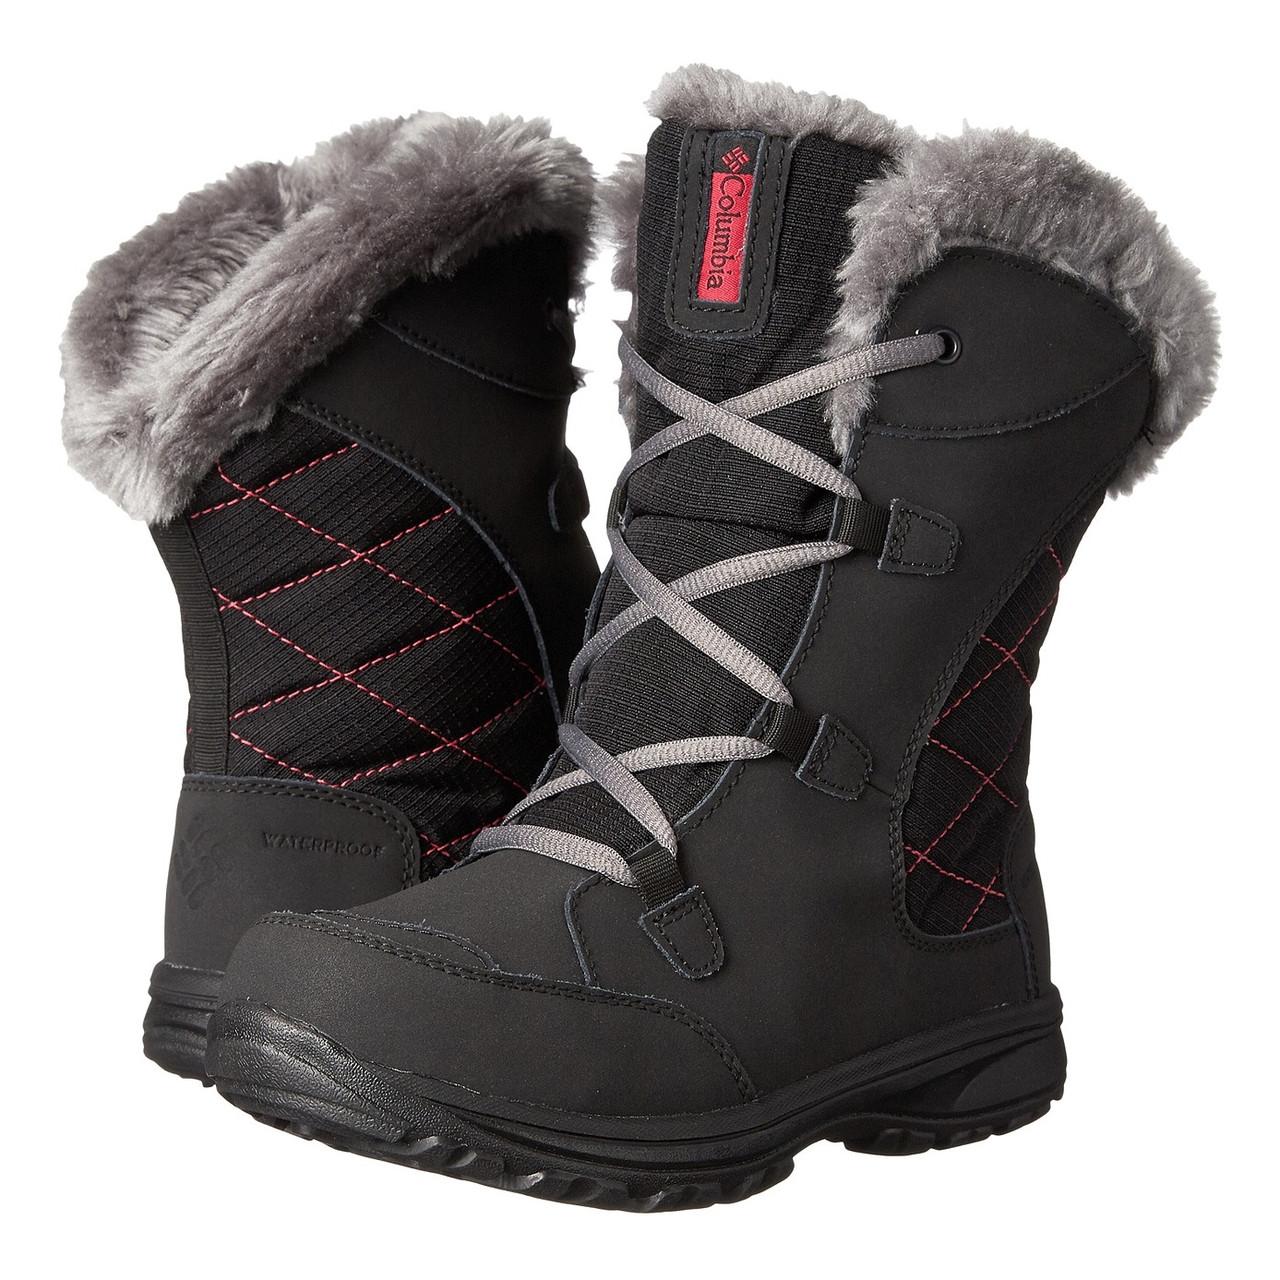 Сапоги зимние для девочки Columbia Youth Ice Maiden Lace Winter Boot